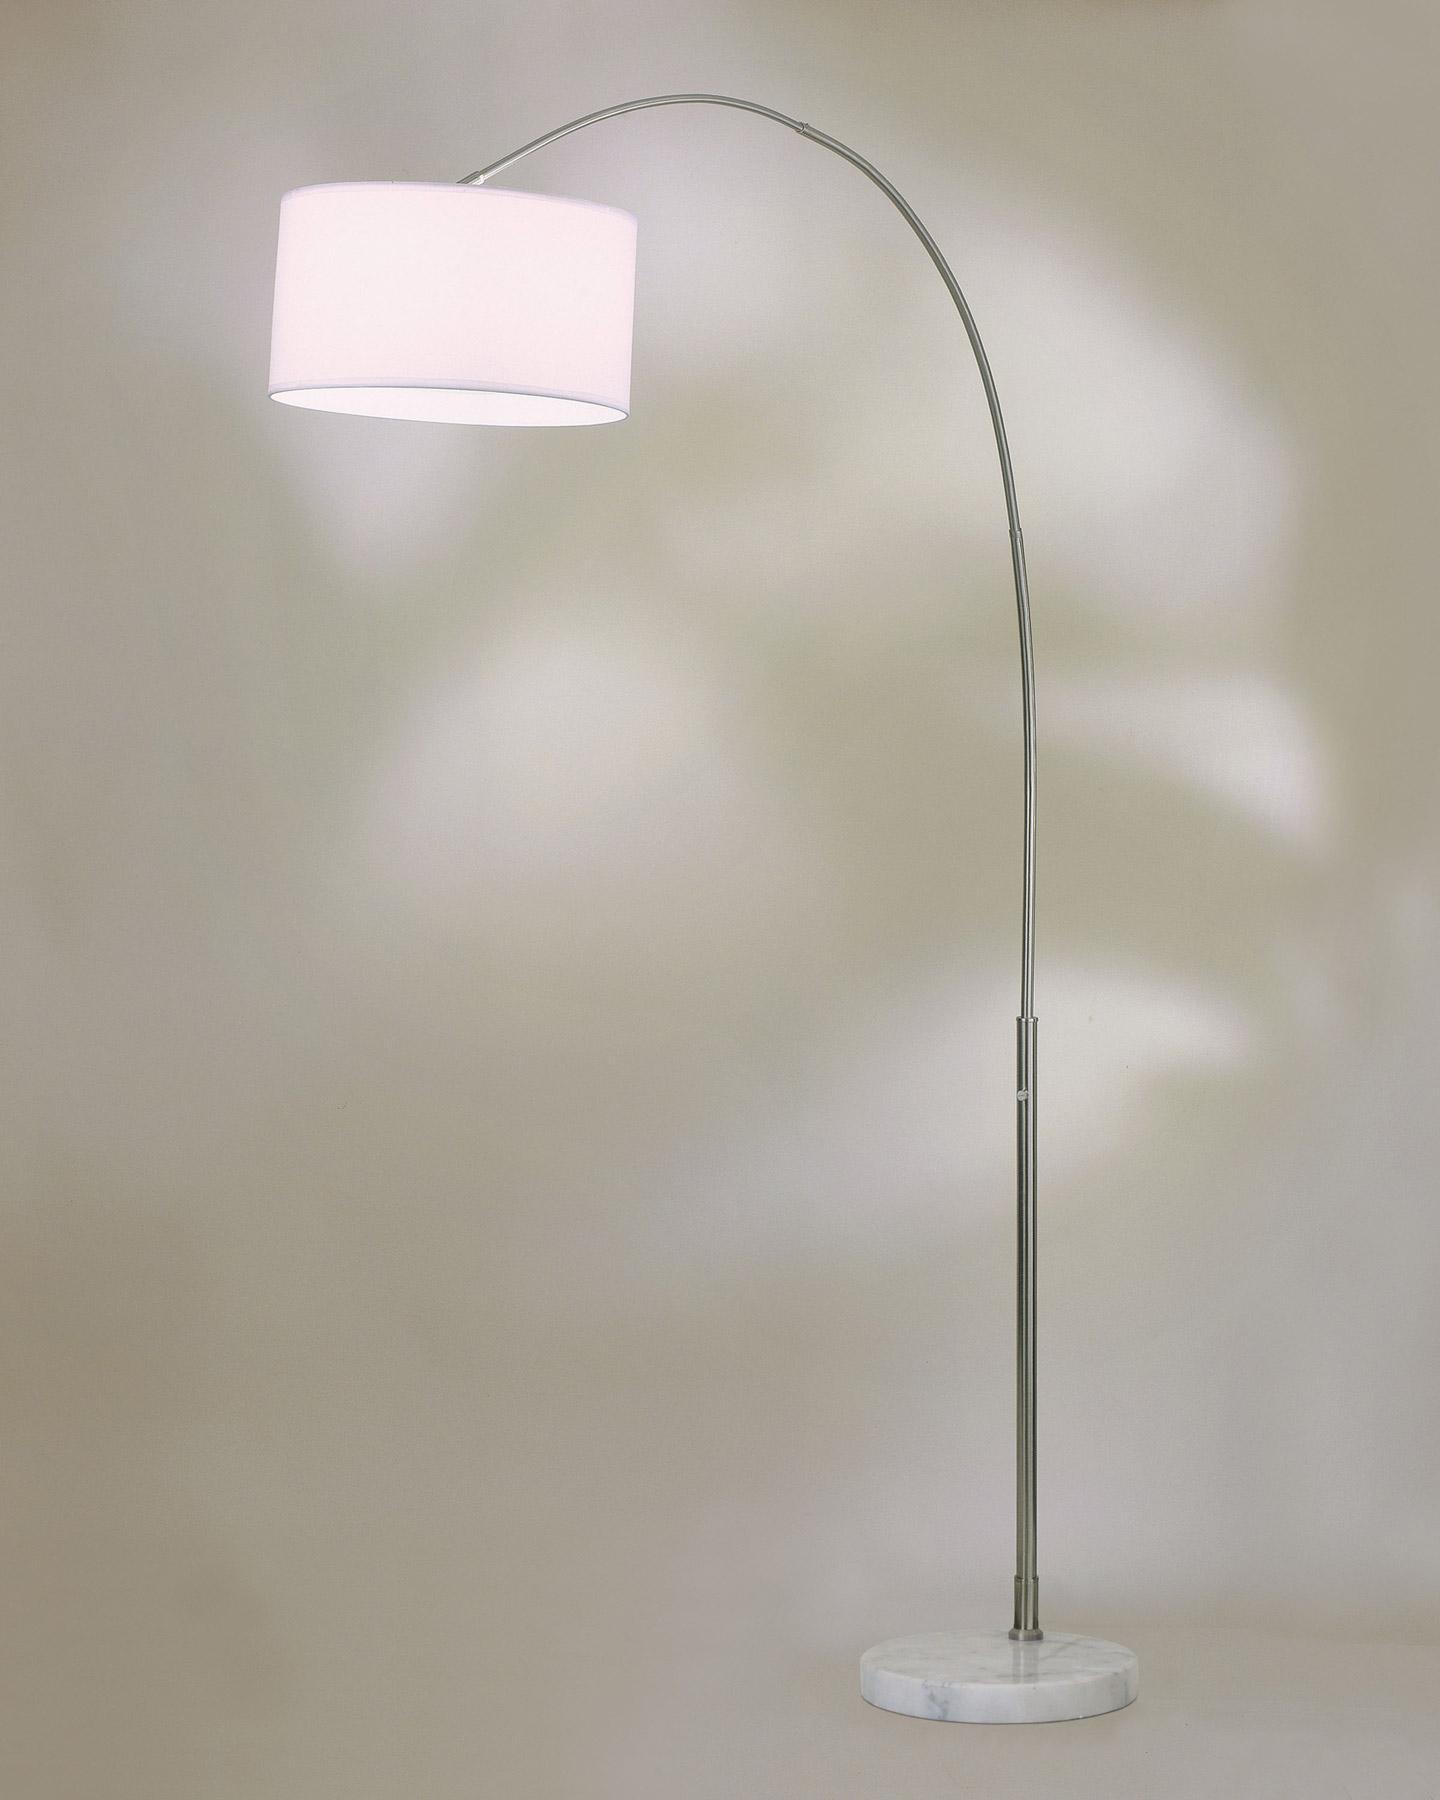 Nova Lighting 4453rg Float Arc Floor Lamp